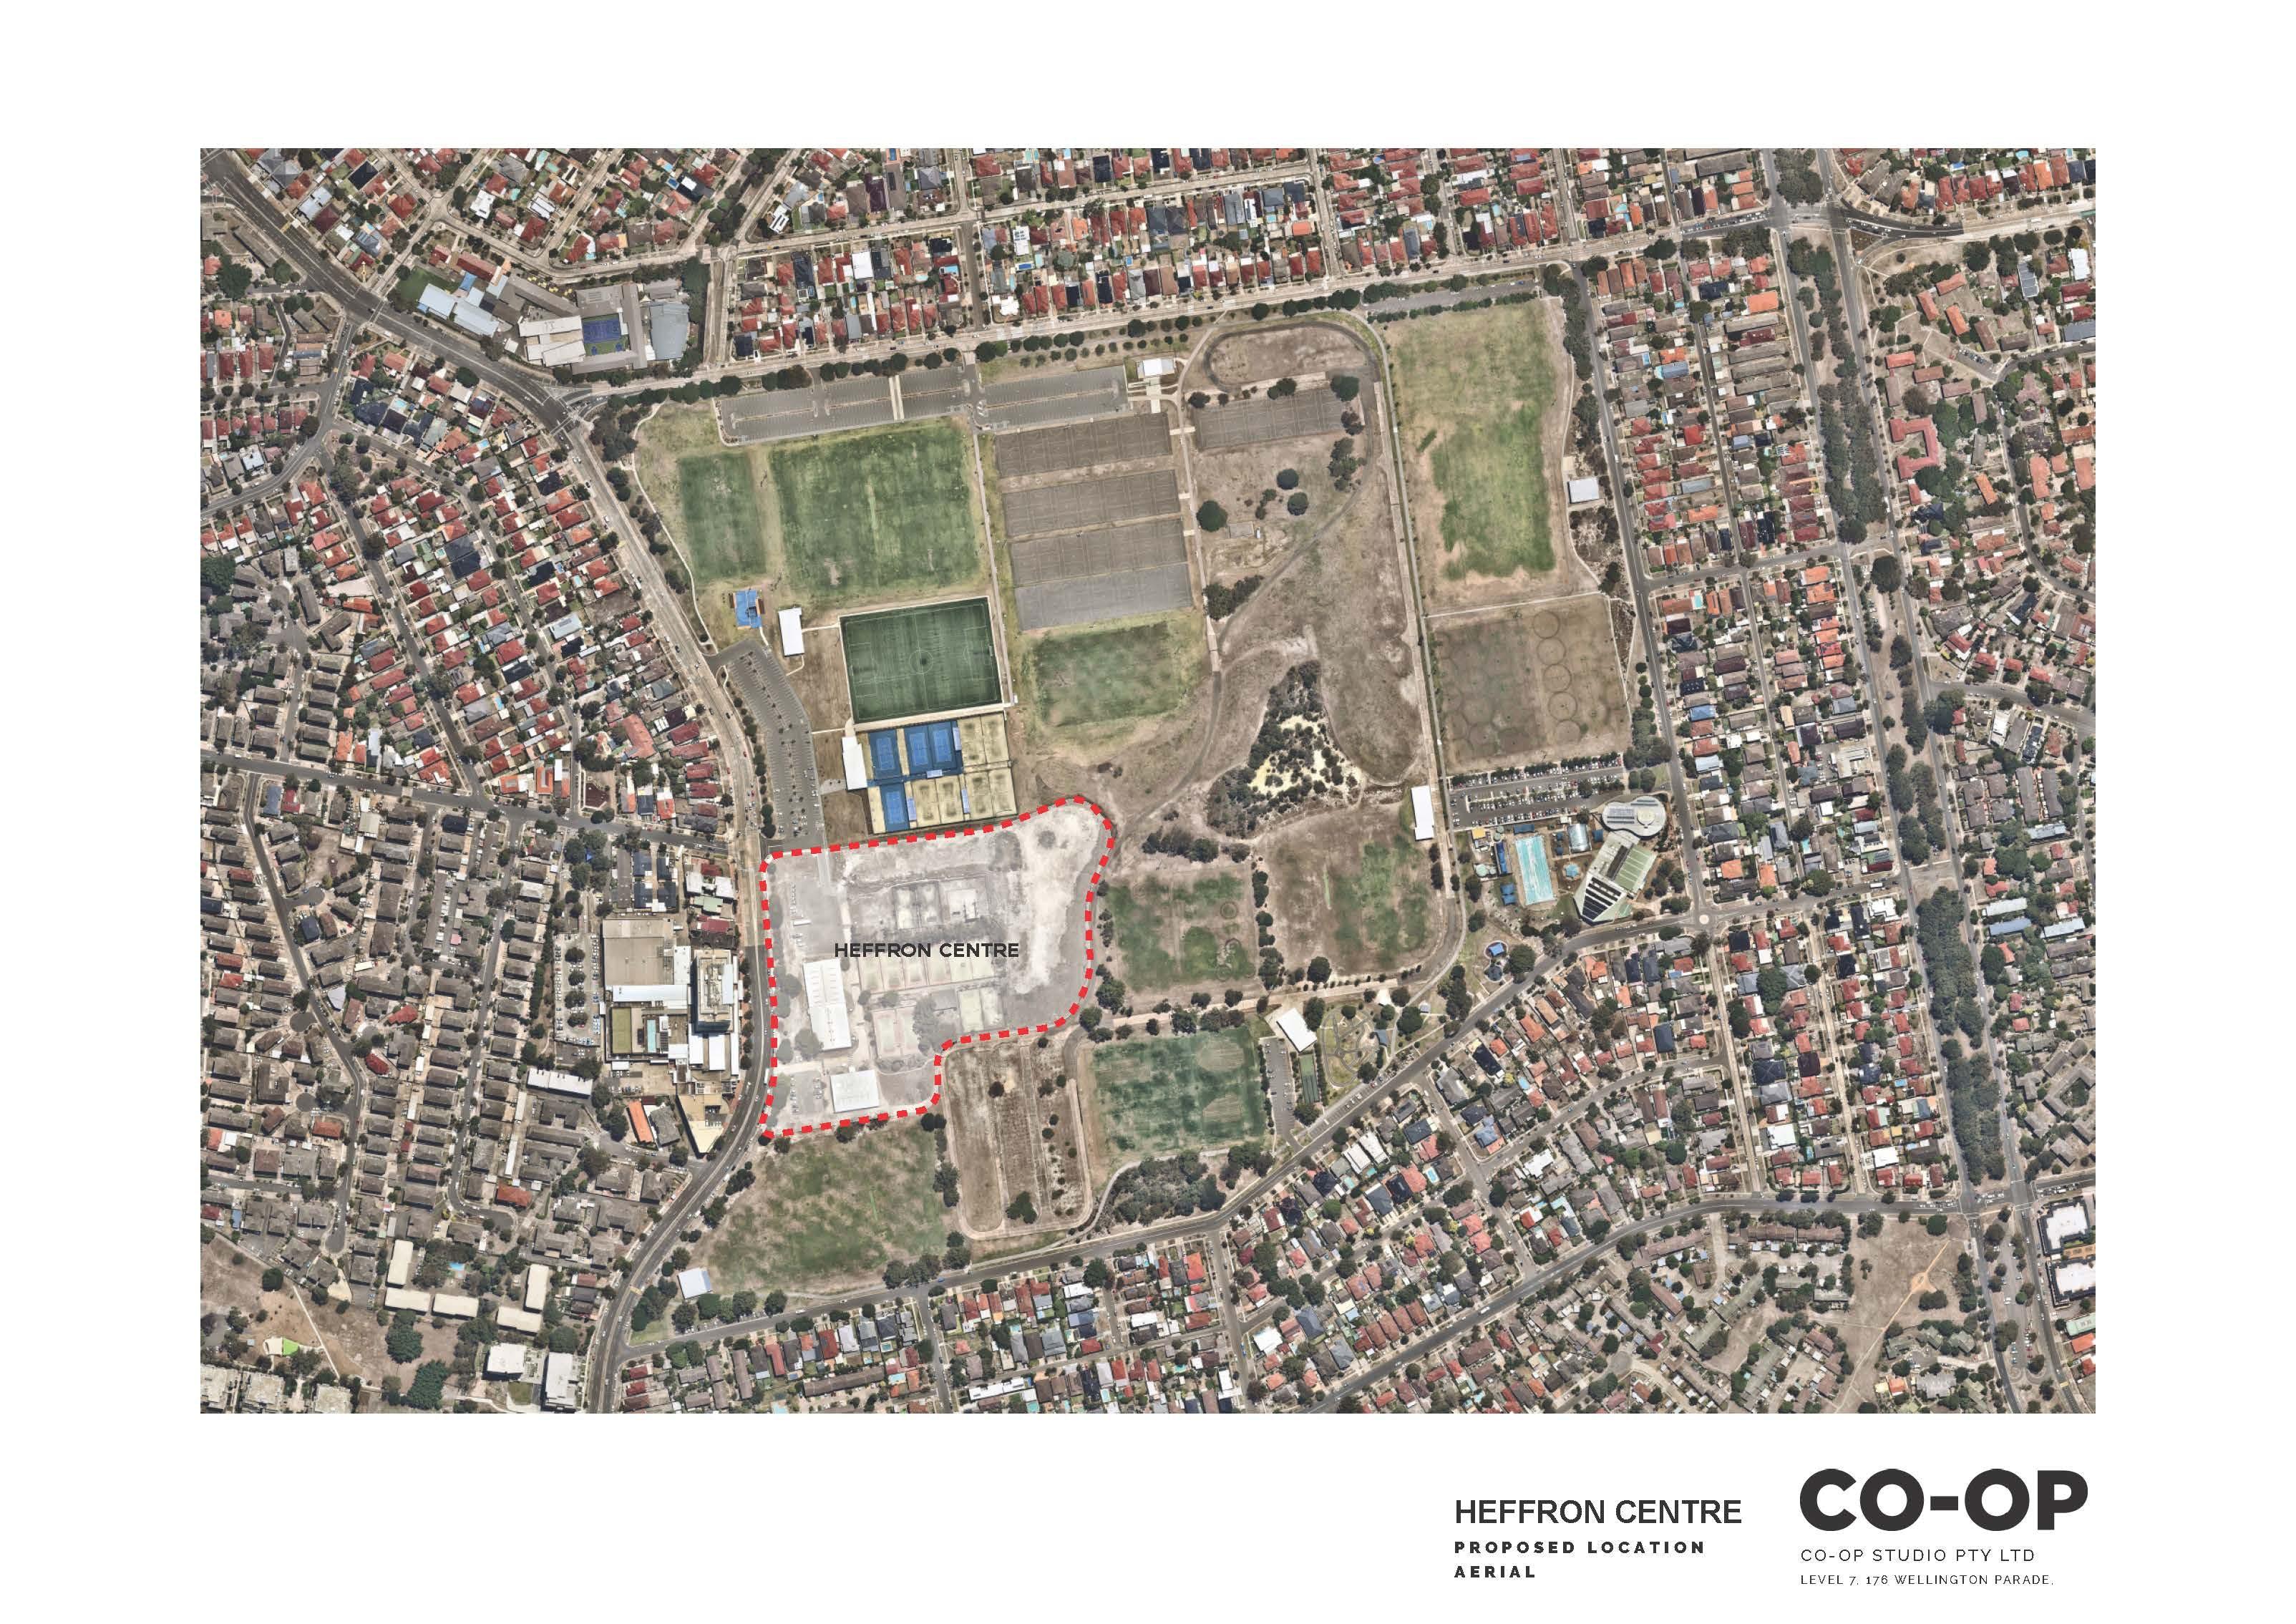 200403_Heffron Centre_Aerial Location (002).jpg